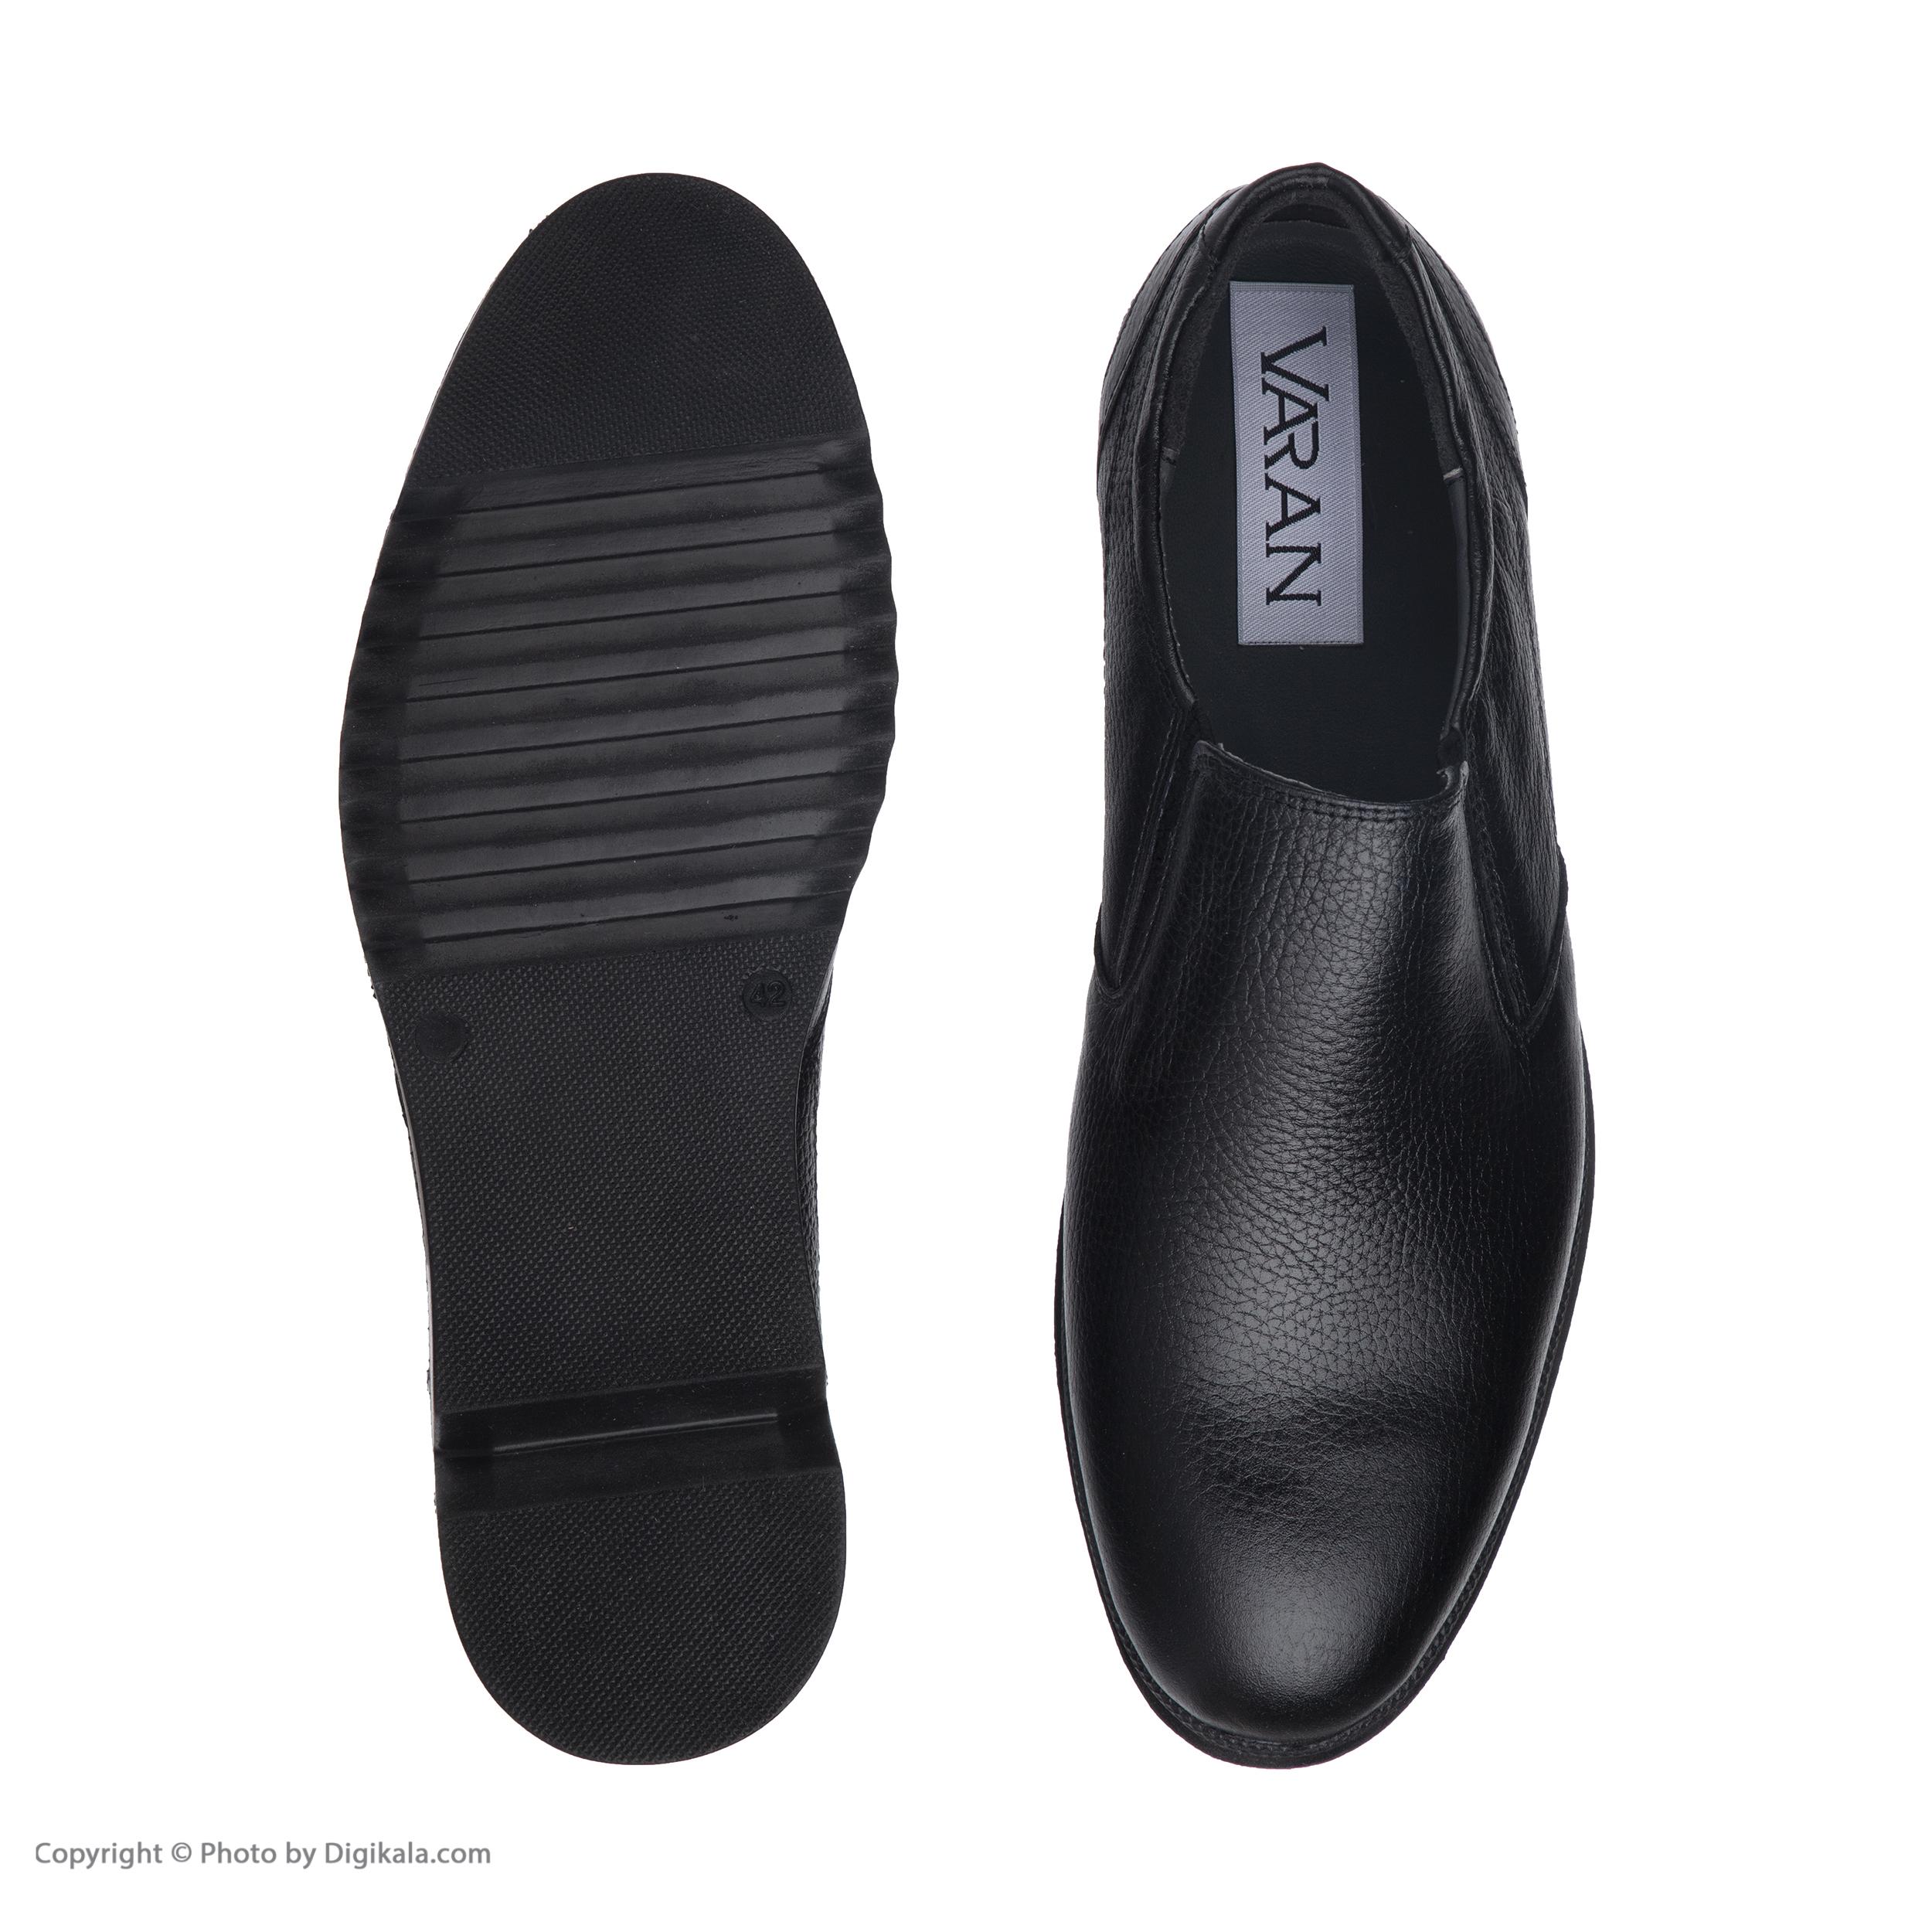 کفش روزمره مردانه واران مدل 7127a503101